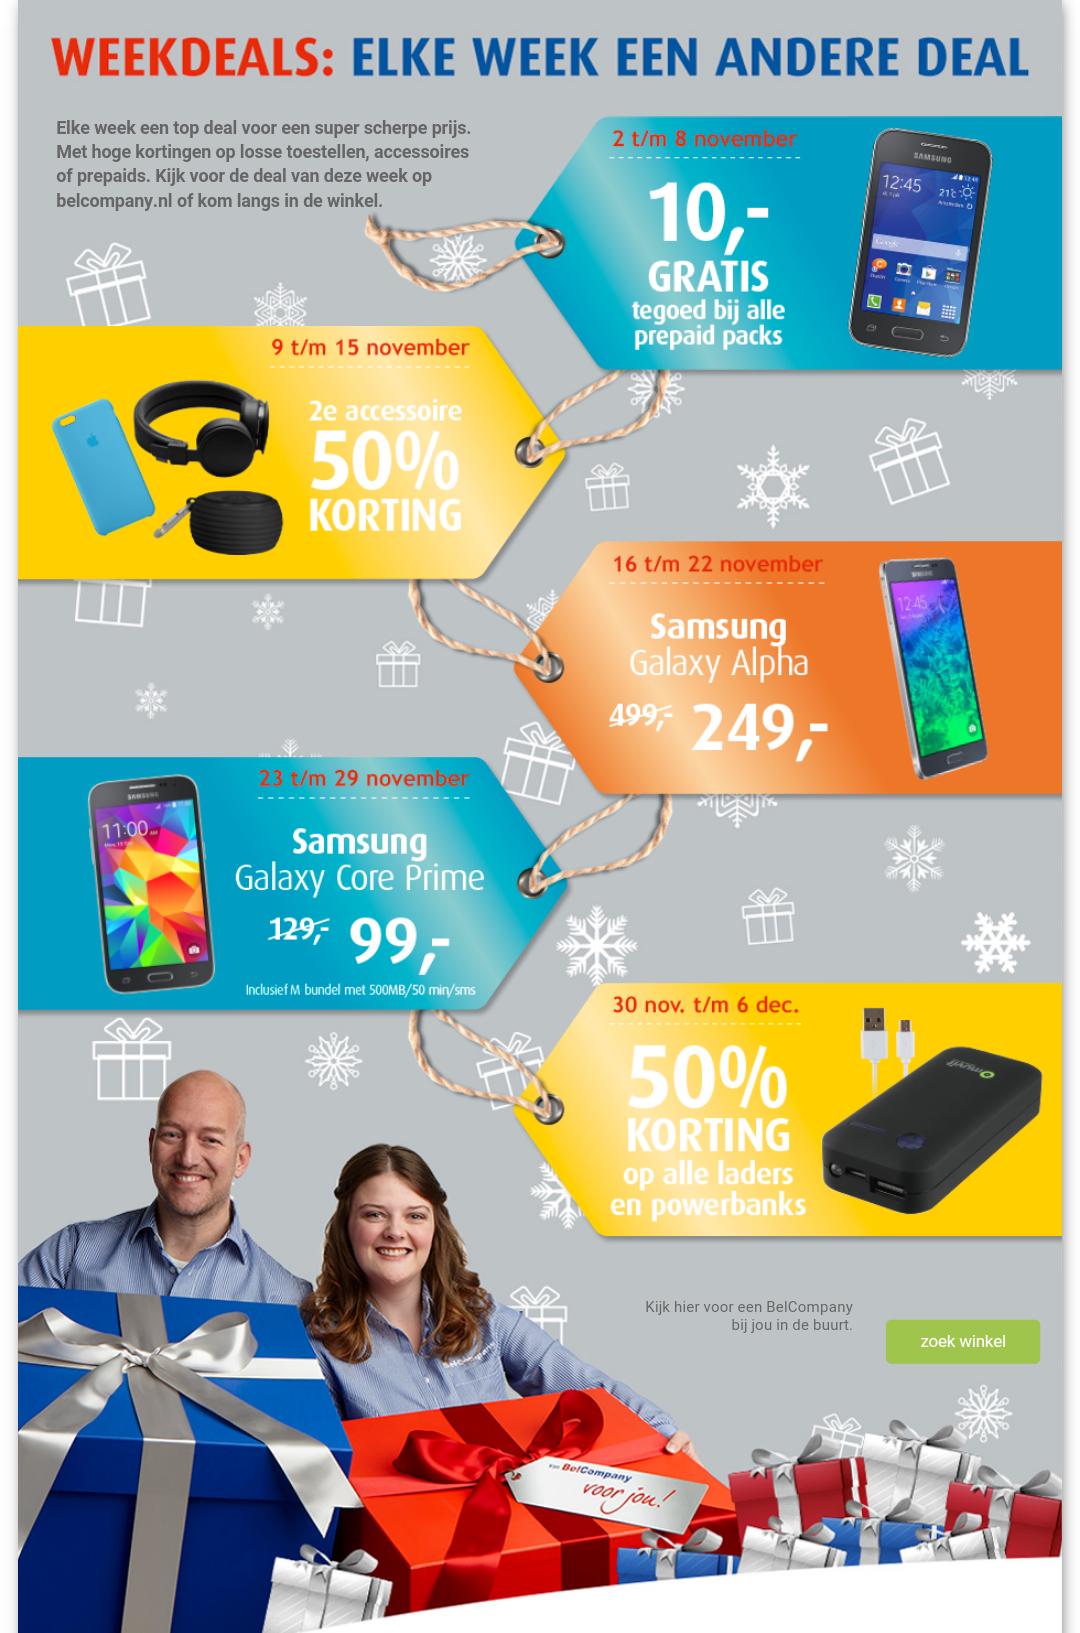 Samsung Galaxy Alpha 32GB - €249 of Samsung Galaxy Core Prime 8GB - €99 (Weekdeals) @ Belcompany